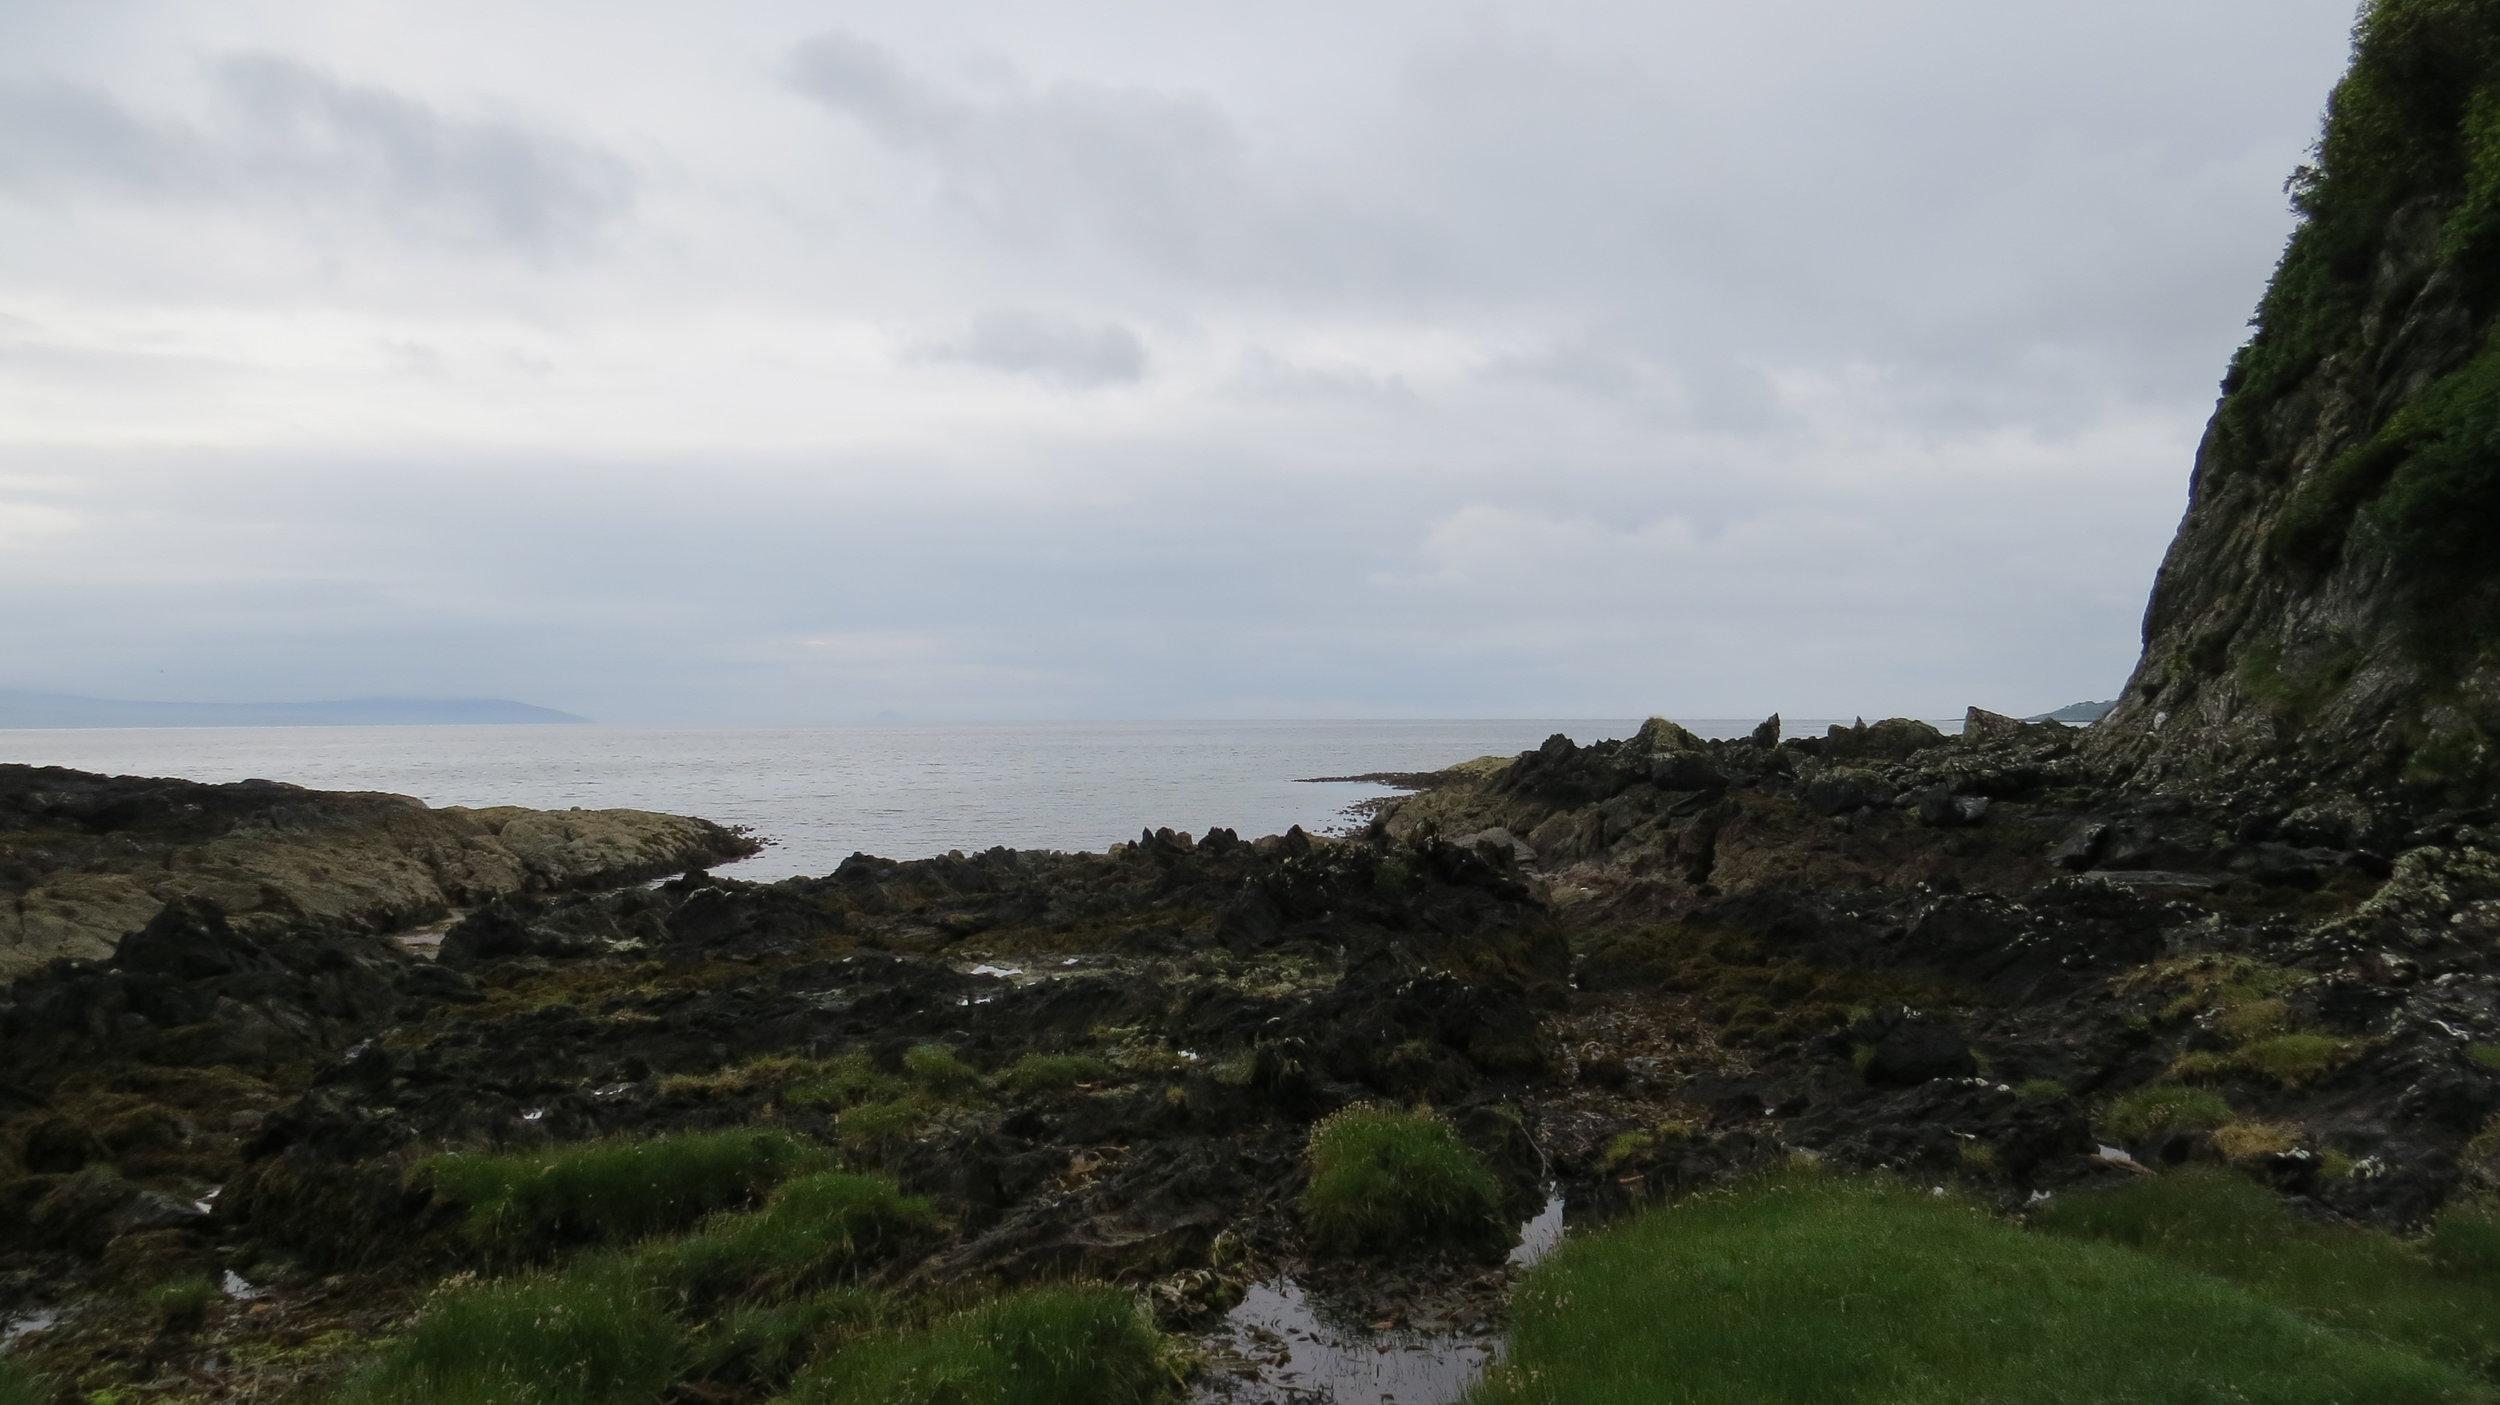 Kintyre Way over Rocks